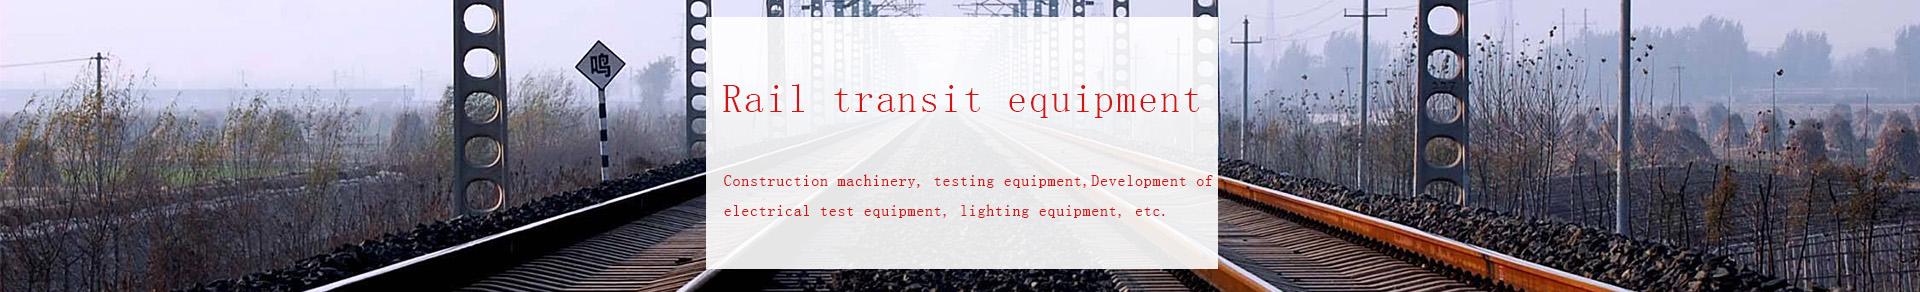 Rail transit equipment